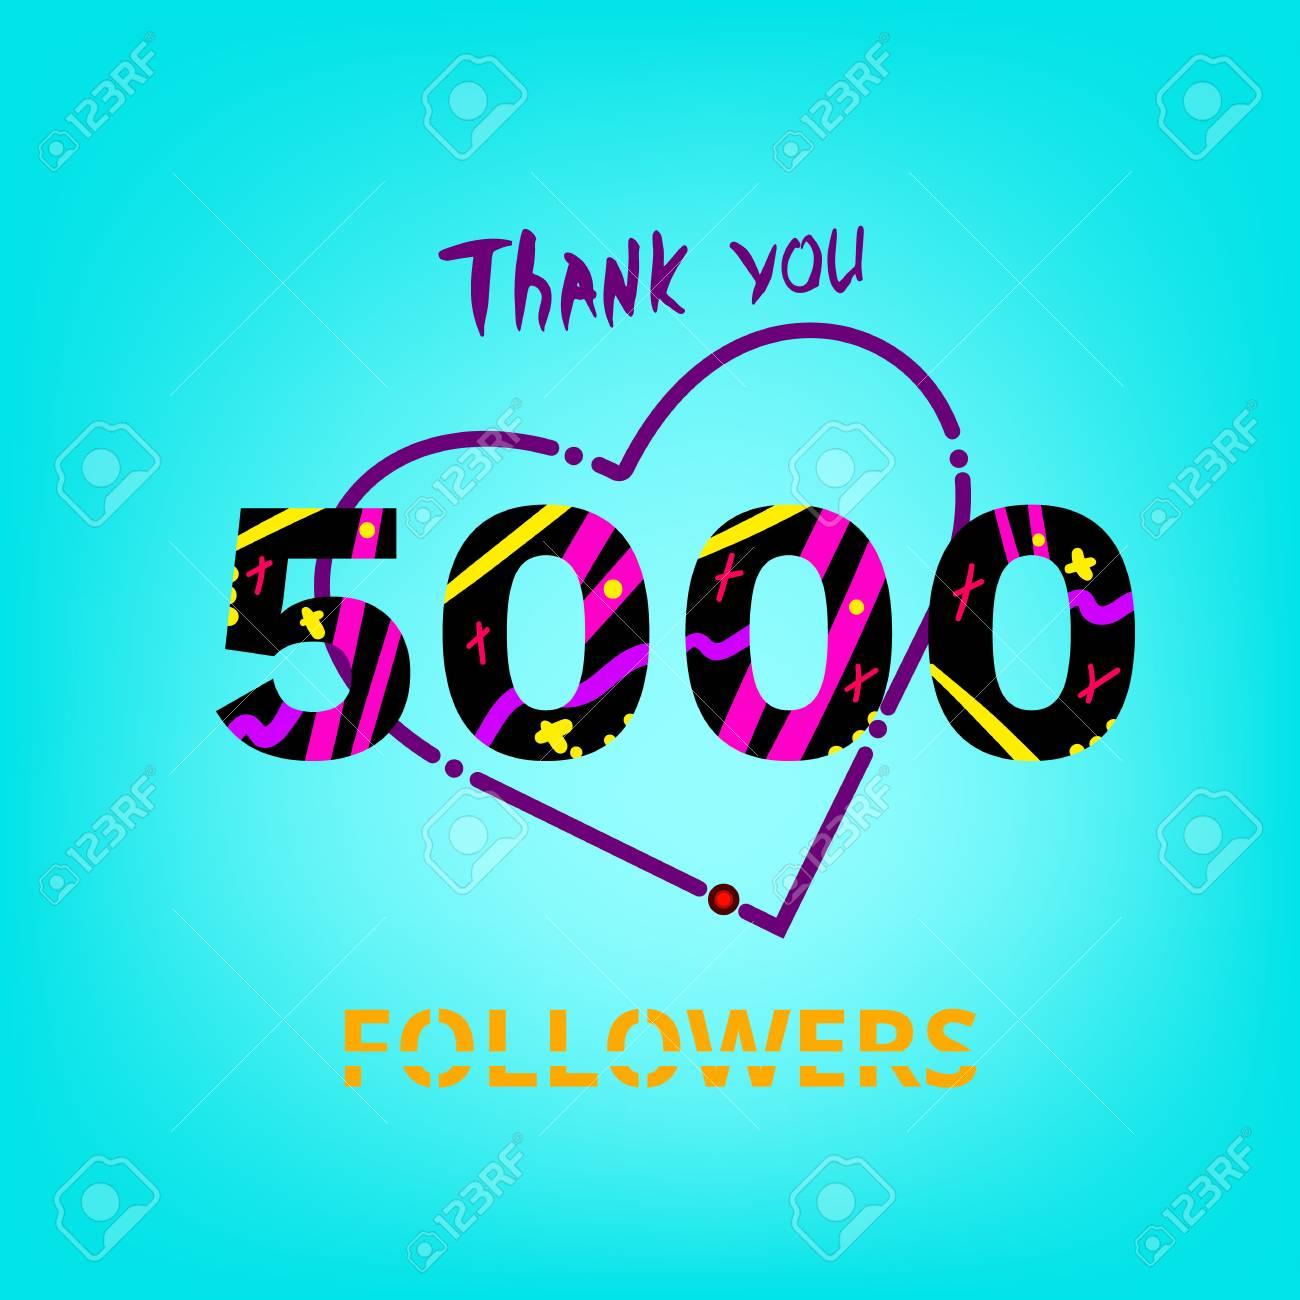 5000 Seguidores Gracias Frase Sobre Fondo Azul Memphis Efecto De Moda De La Tipografía Banner De 5k Suscriptores Para Blog Plantilla Para